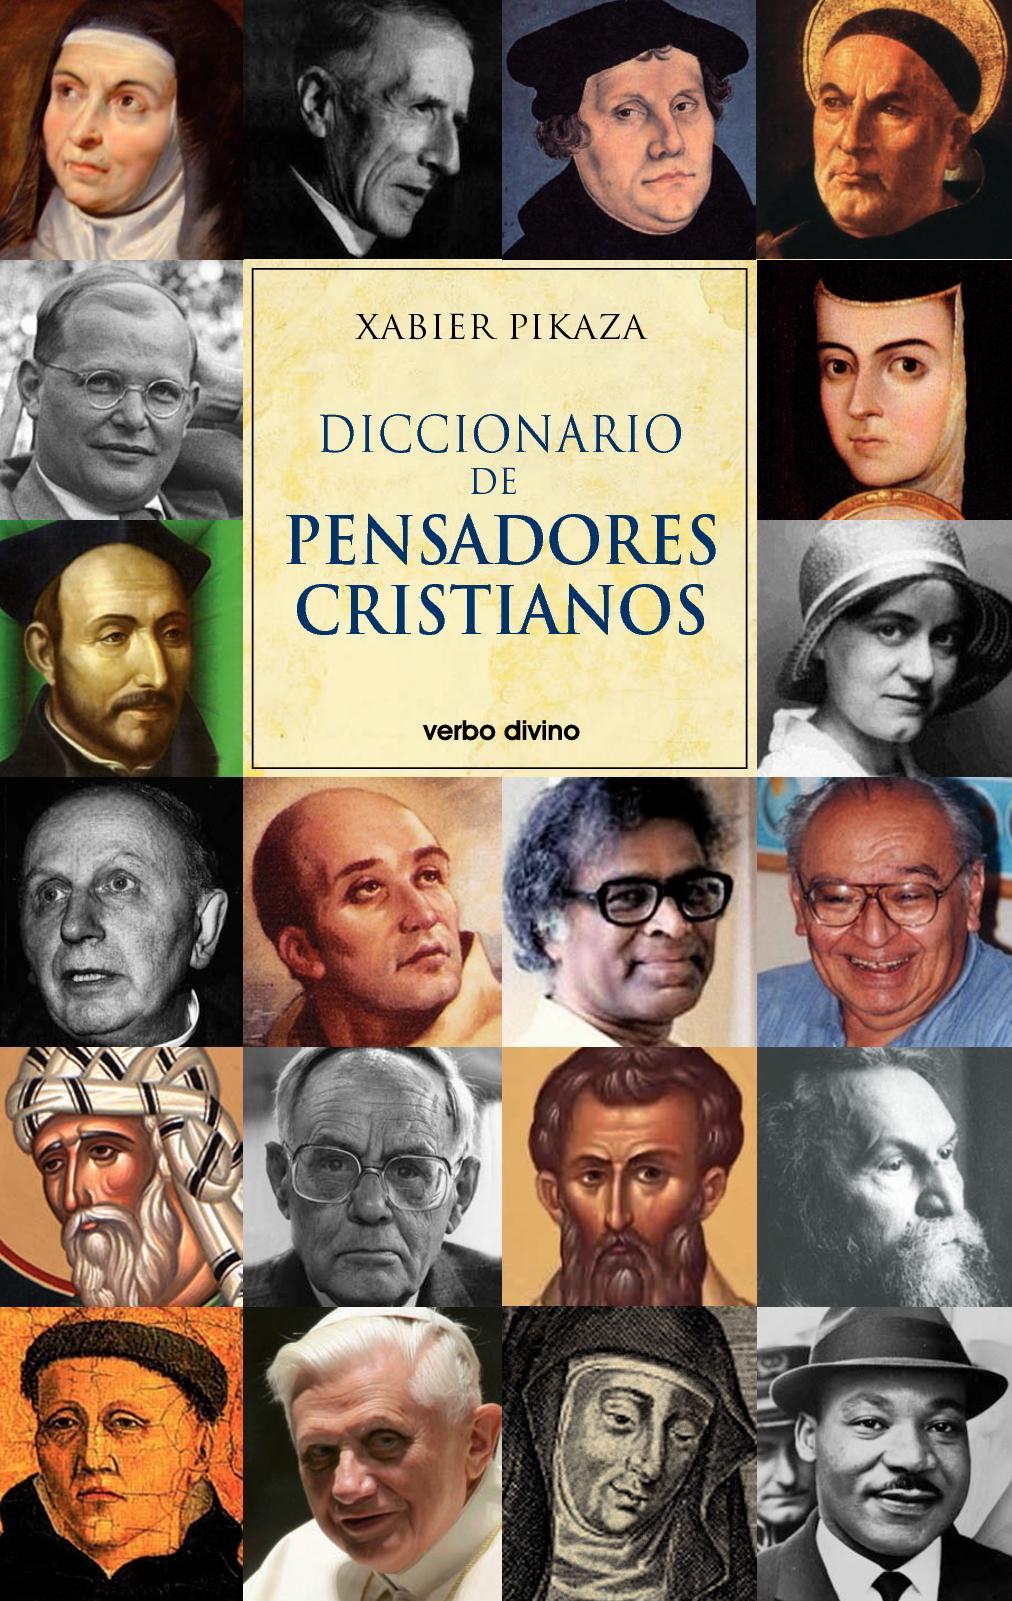 Calaméo - Diccionario De Pensadores Cristianos Parte 1 Xabier Pikaza